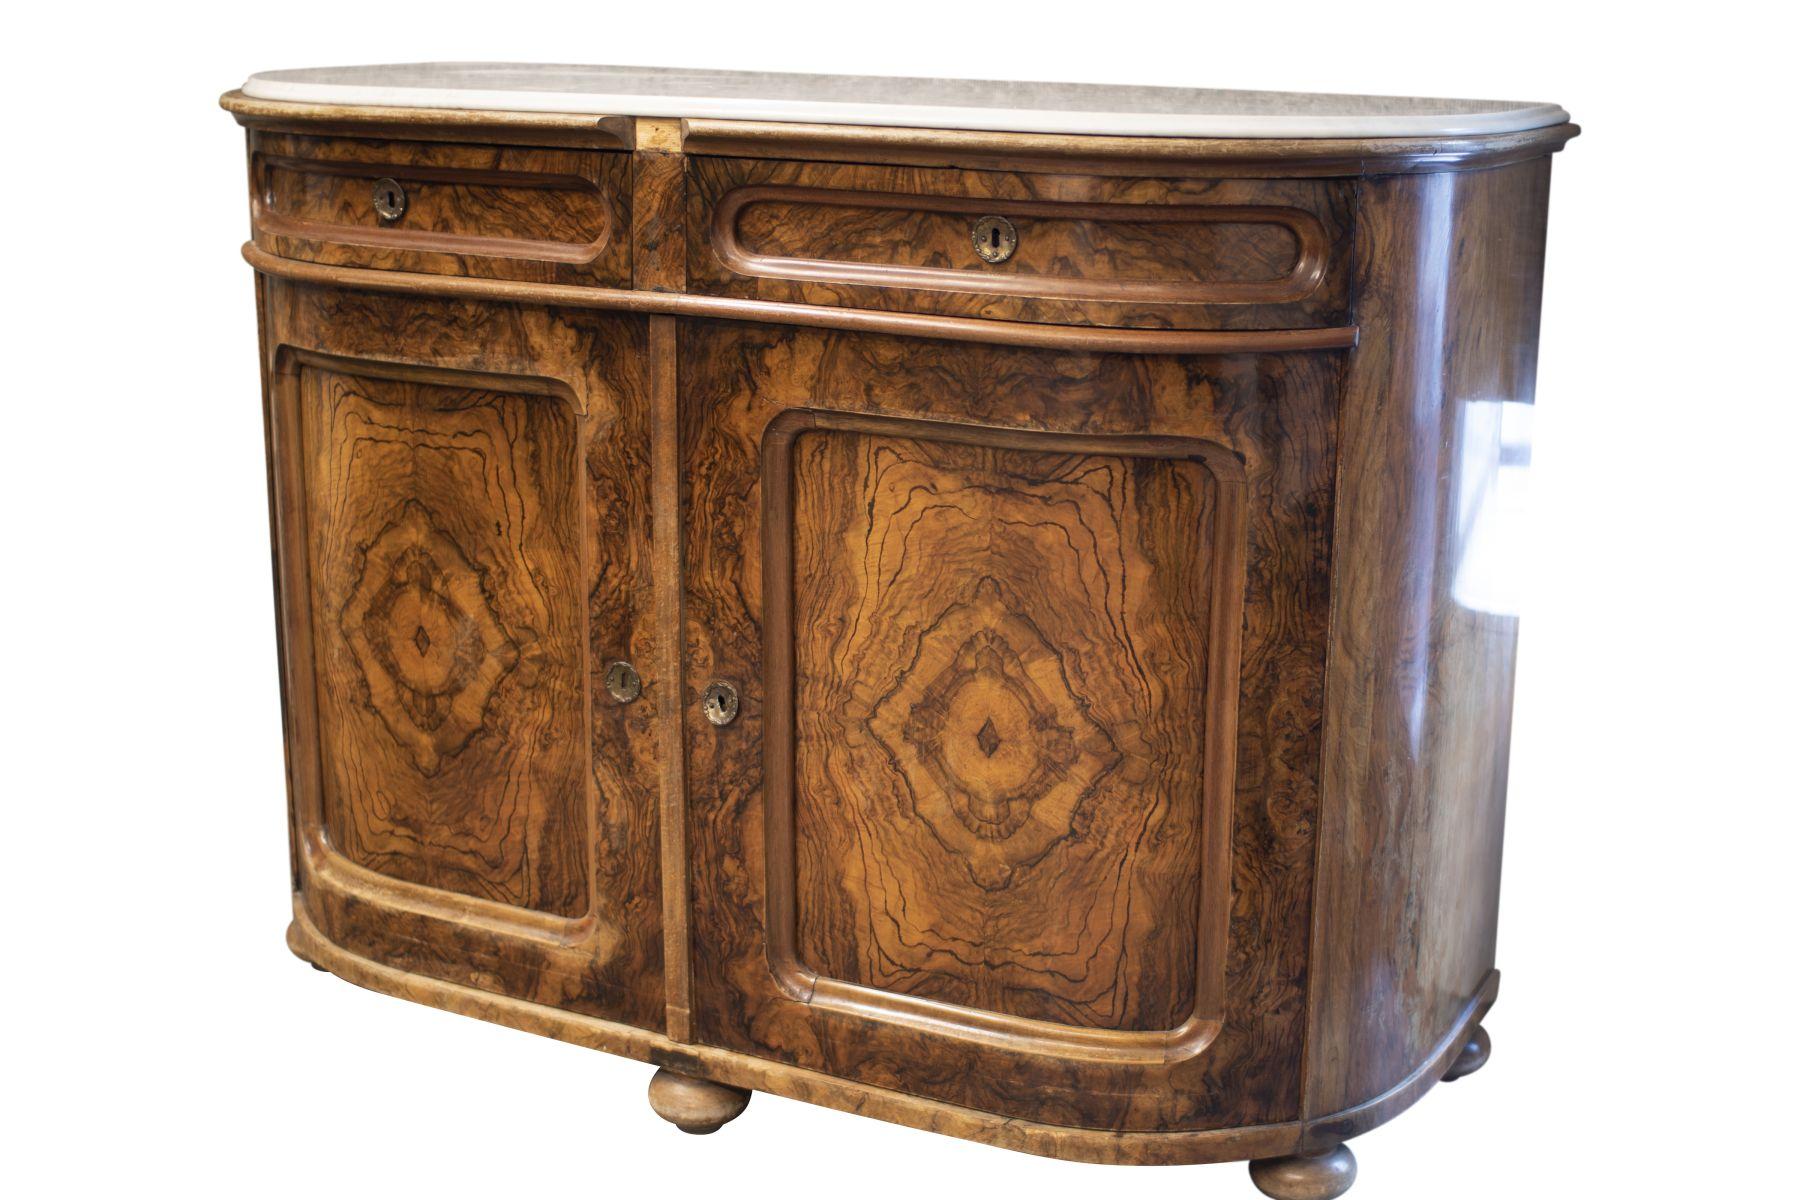 #39 Salon Dresser with Profiled Marble Top   Salon Kommode mit profilierter Marmorplatte Image